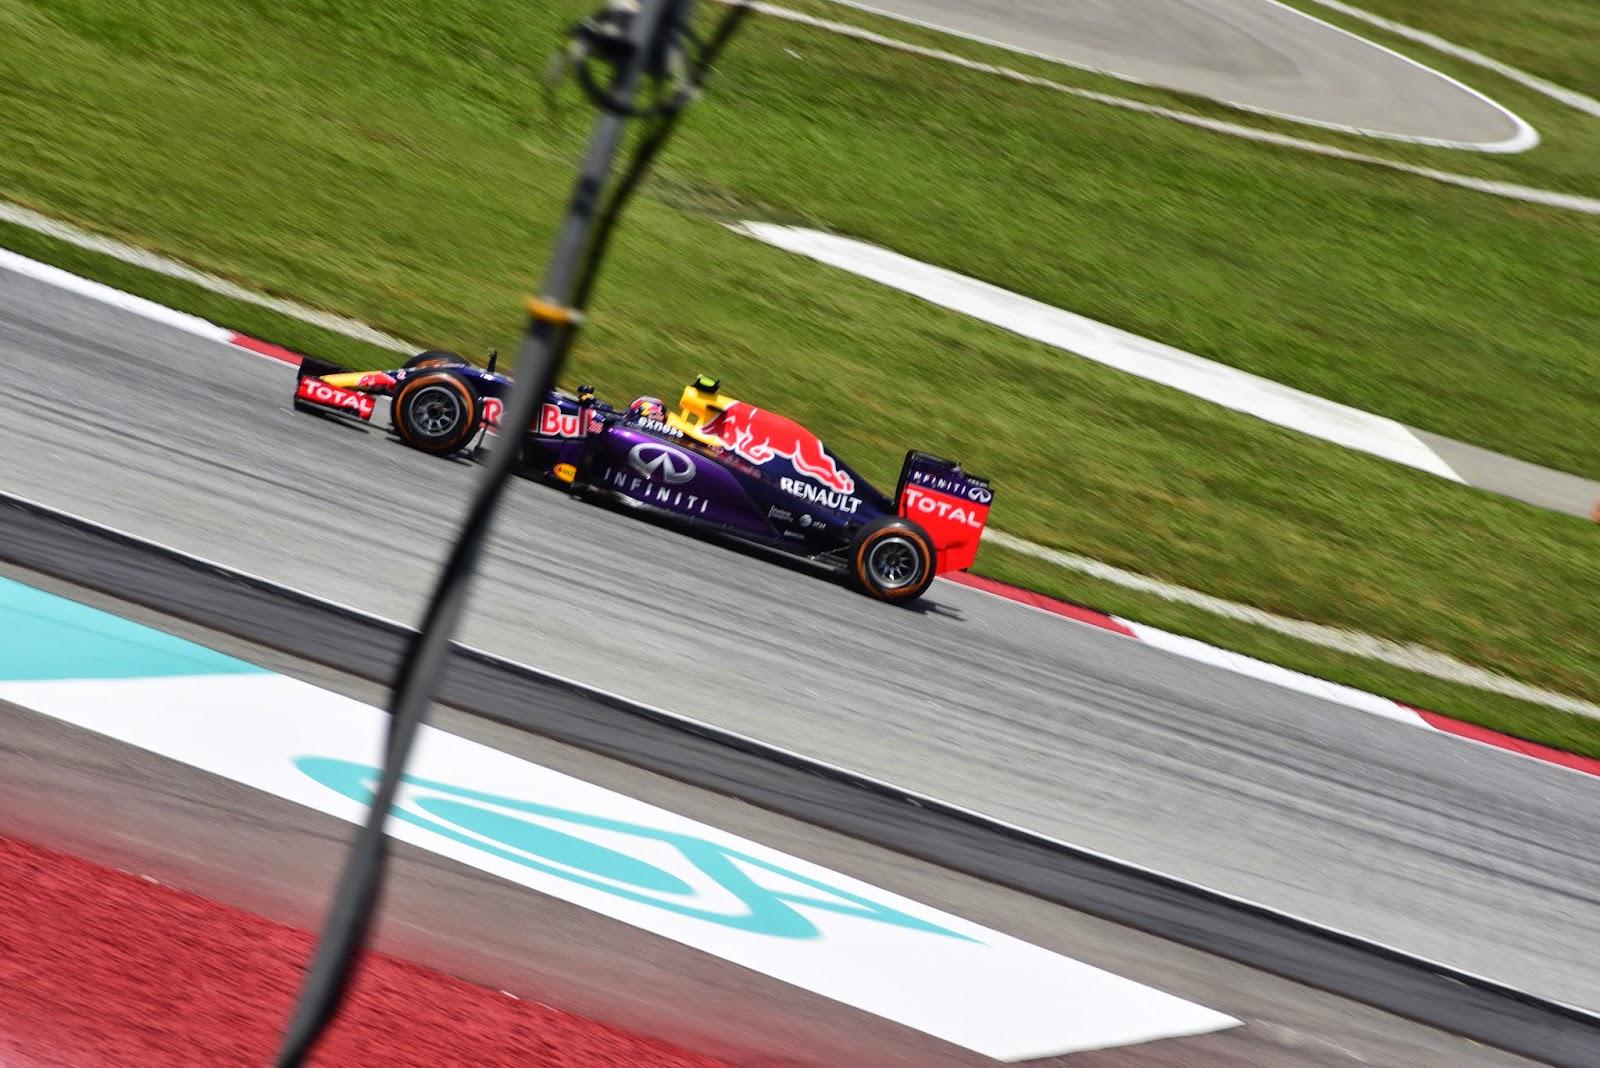 Ricciardo in a red bull car